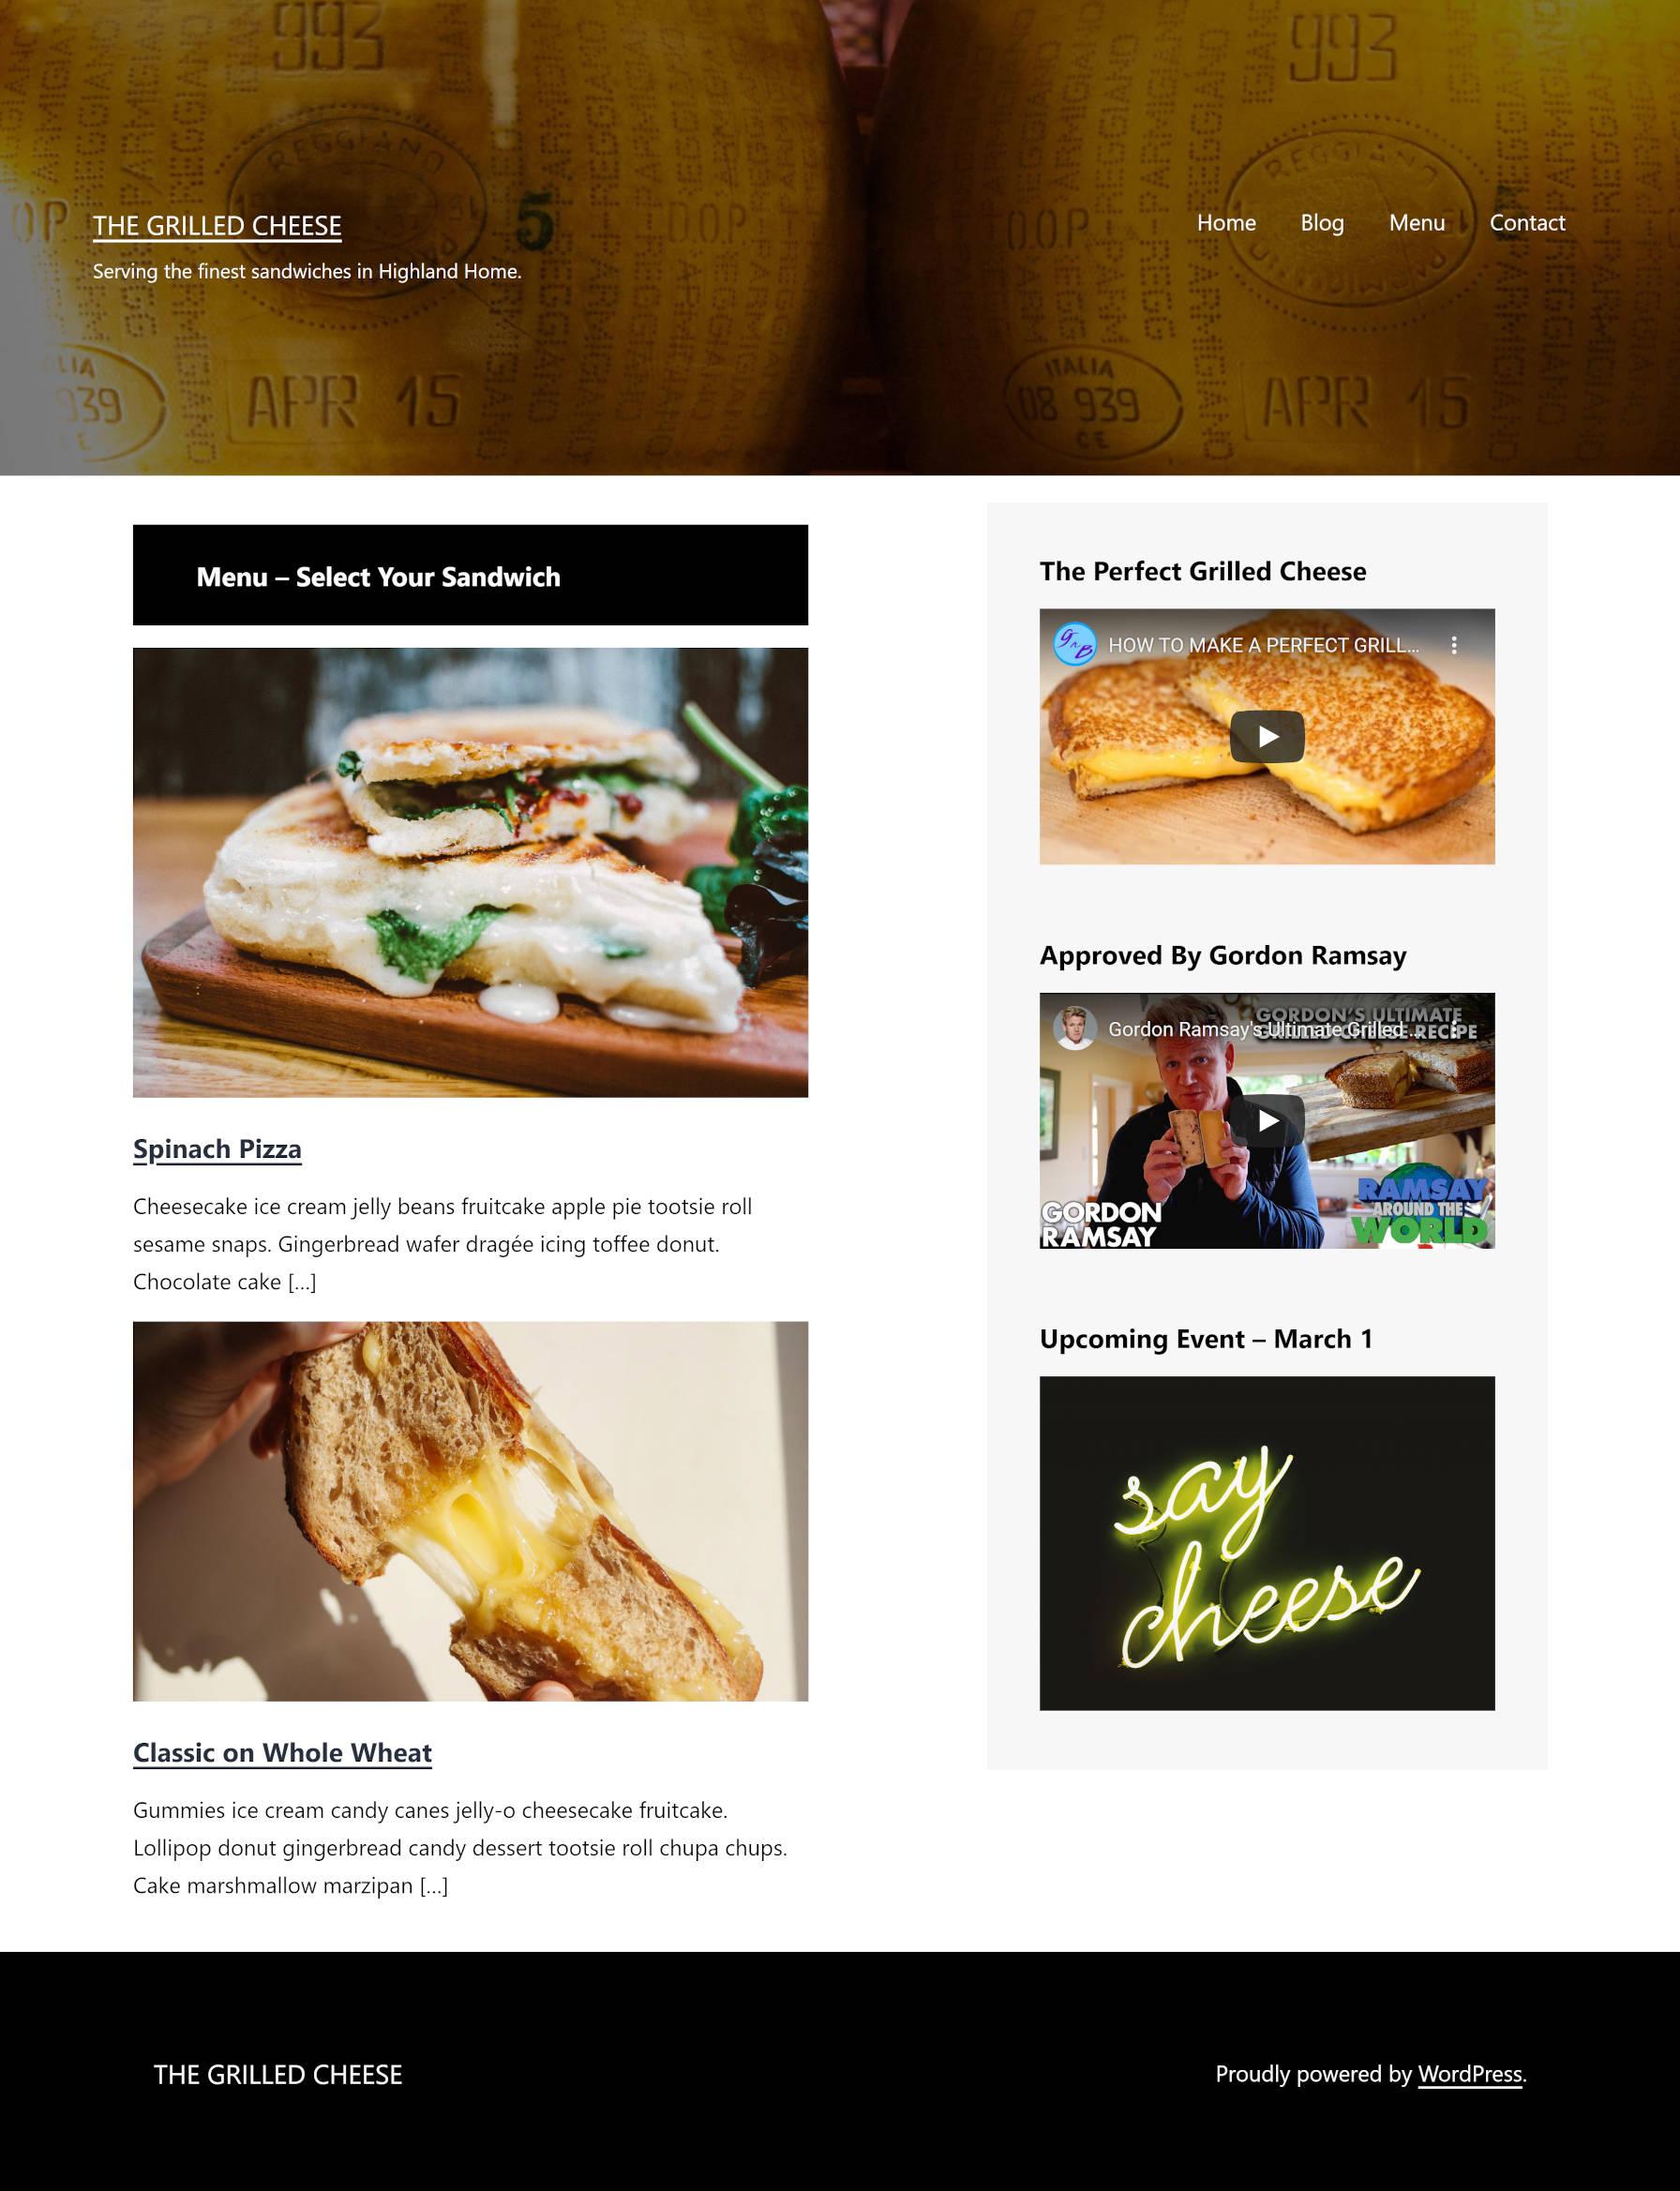 Custom-designed homepage via Gutenberg's site editor for a fictitious restaurant.